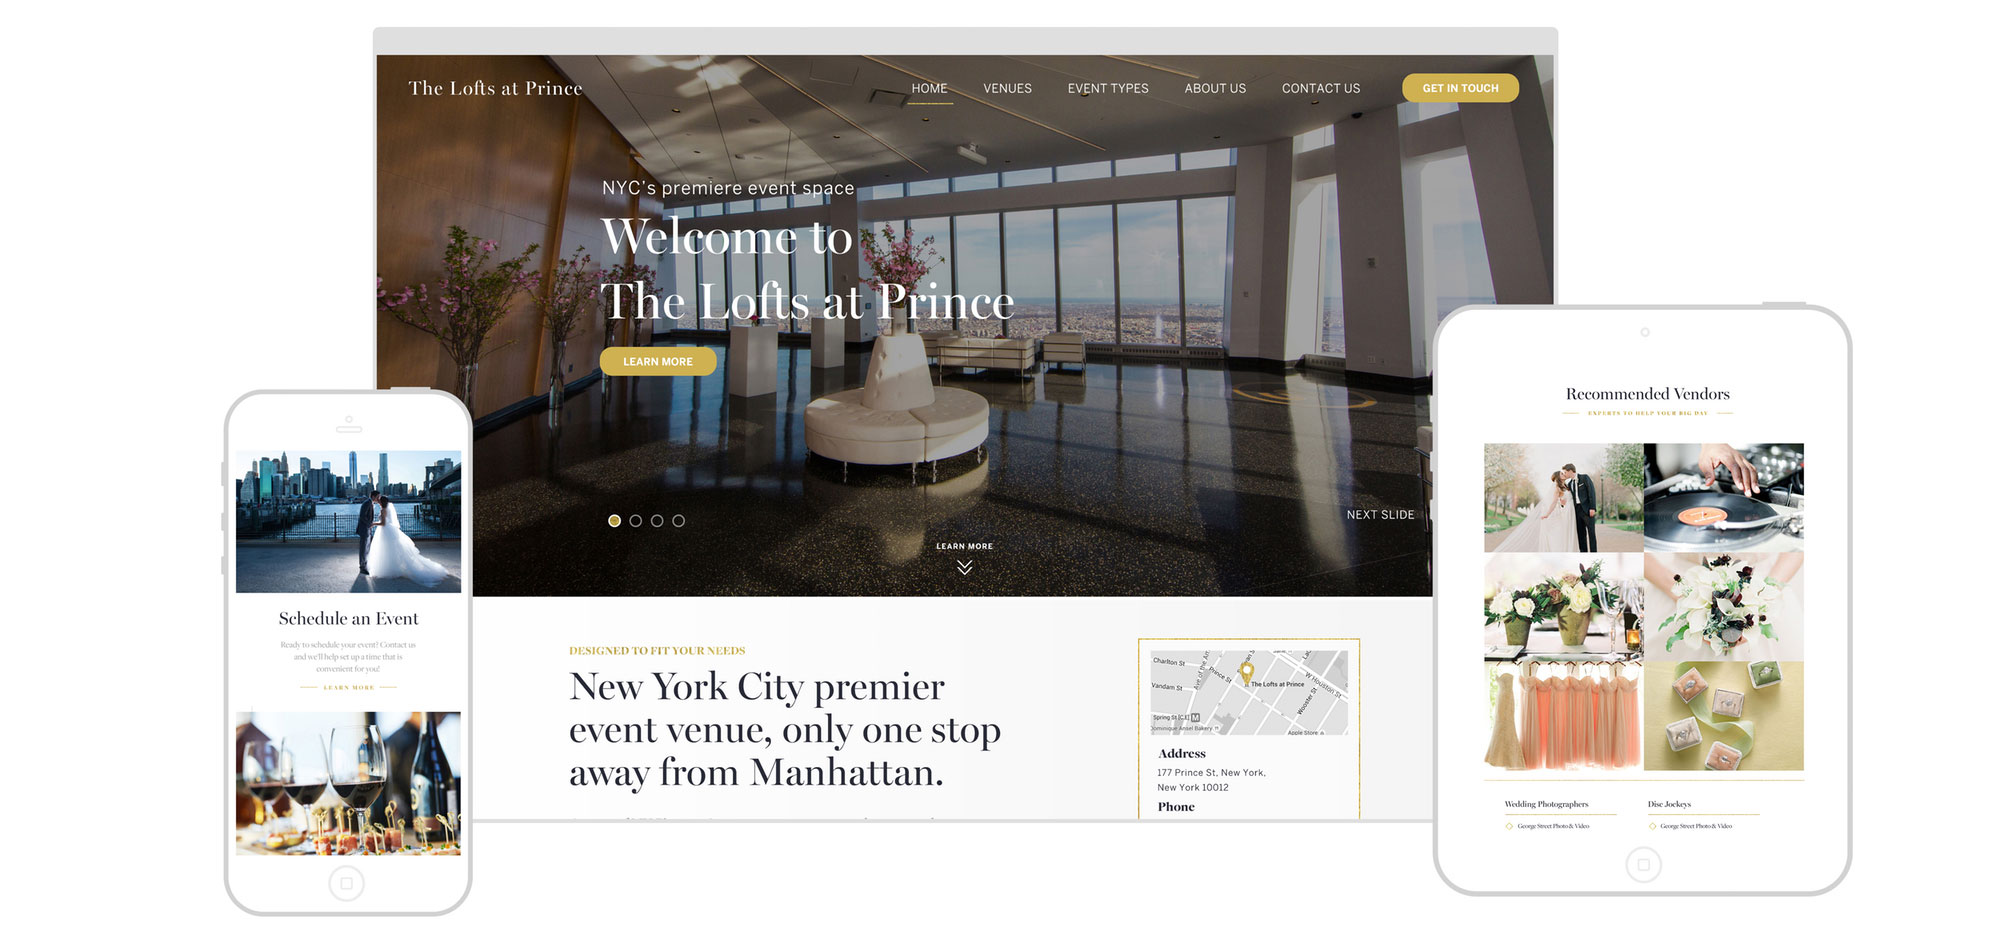 Web Design | The Lofts at Prince